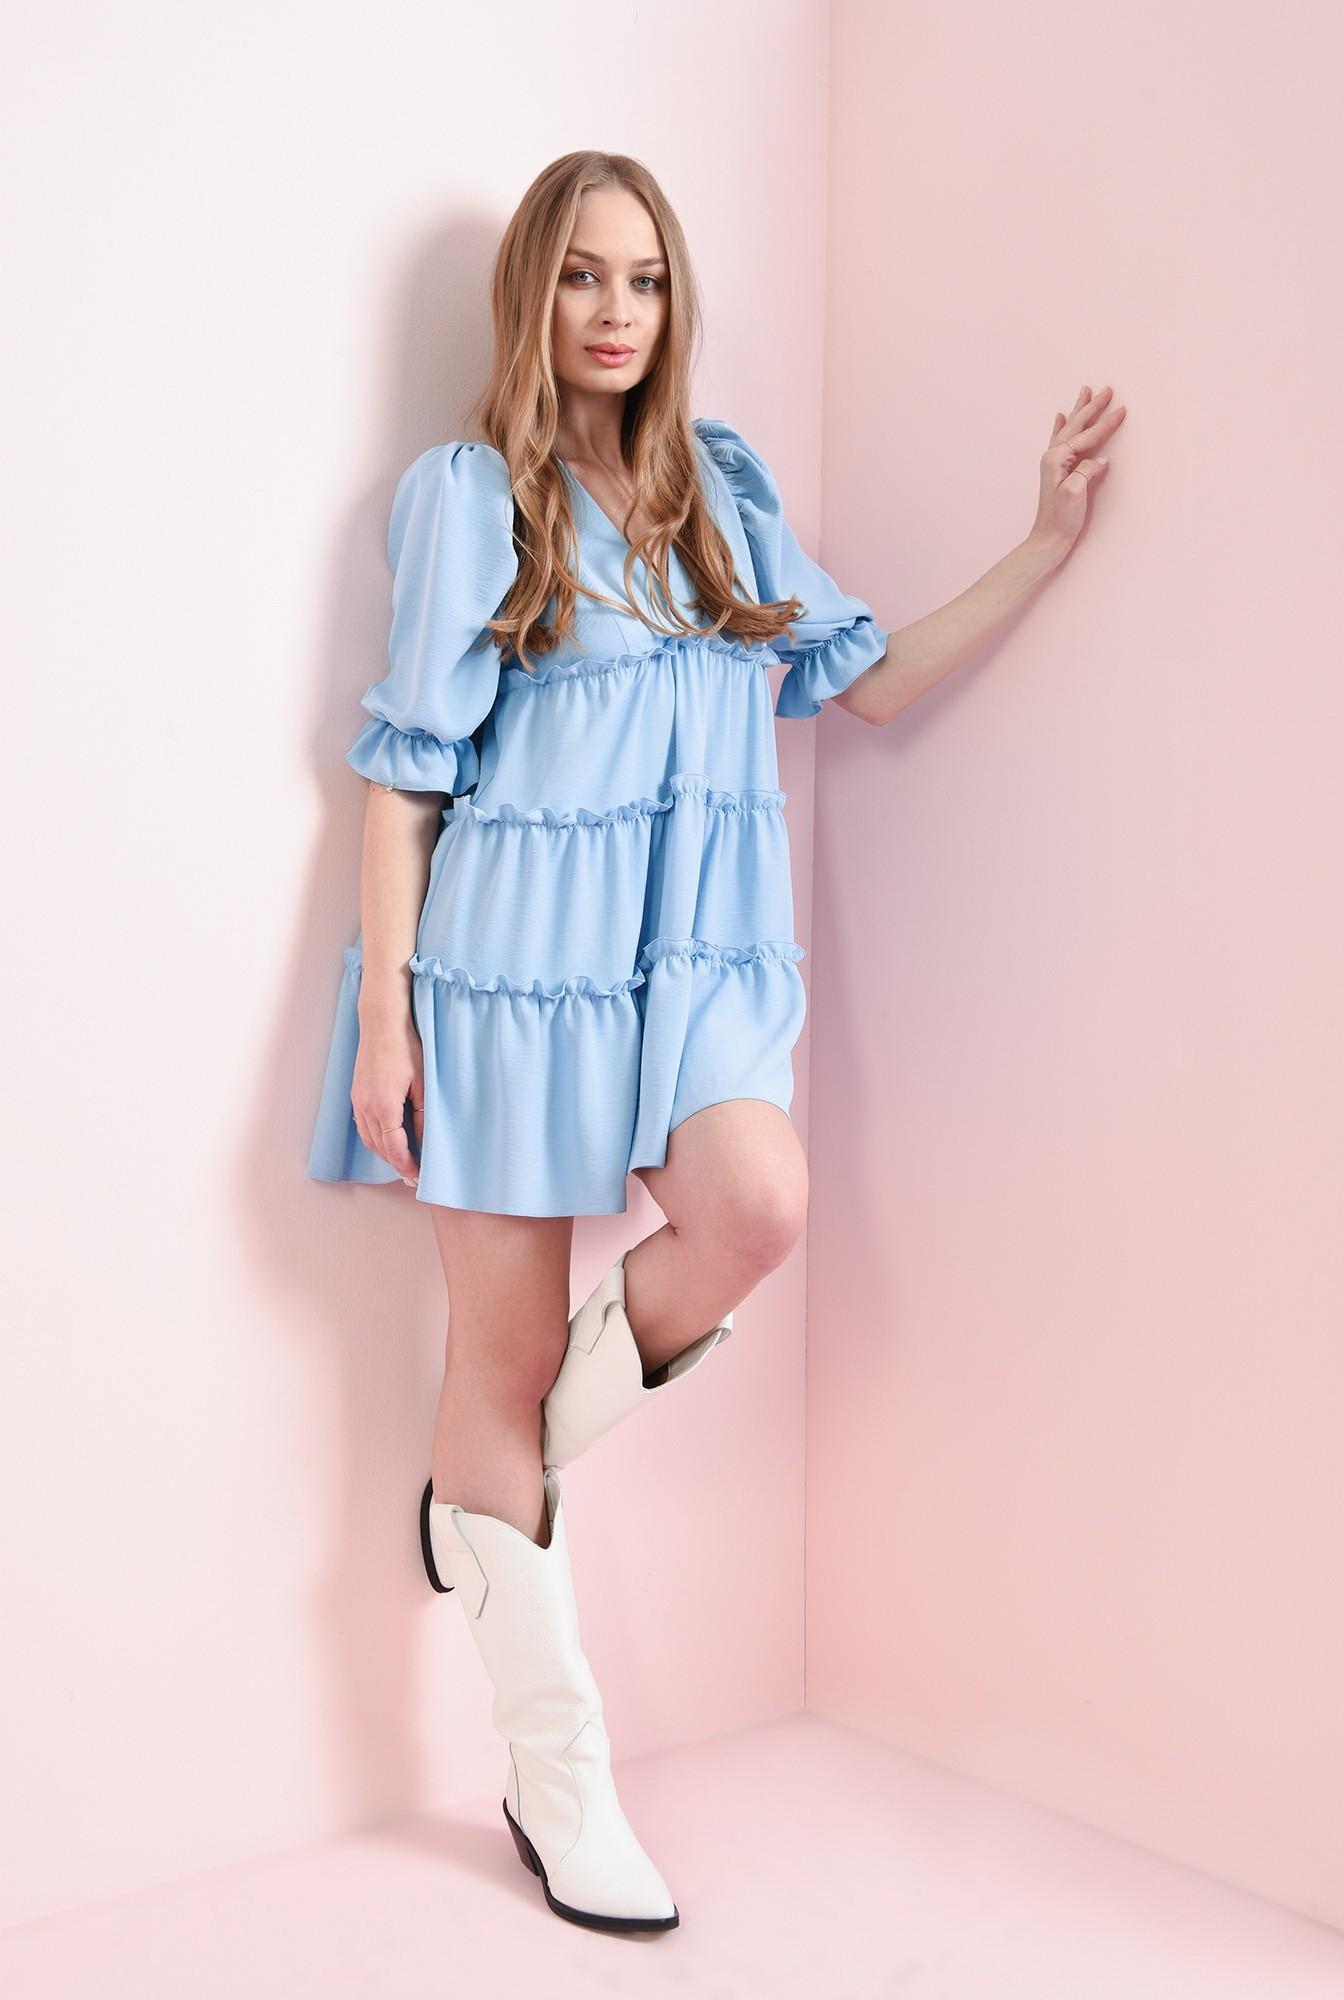 0 - rochie bleu, cu maneca voluminoasa